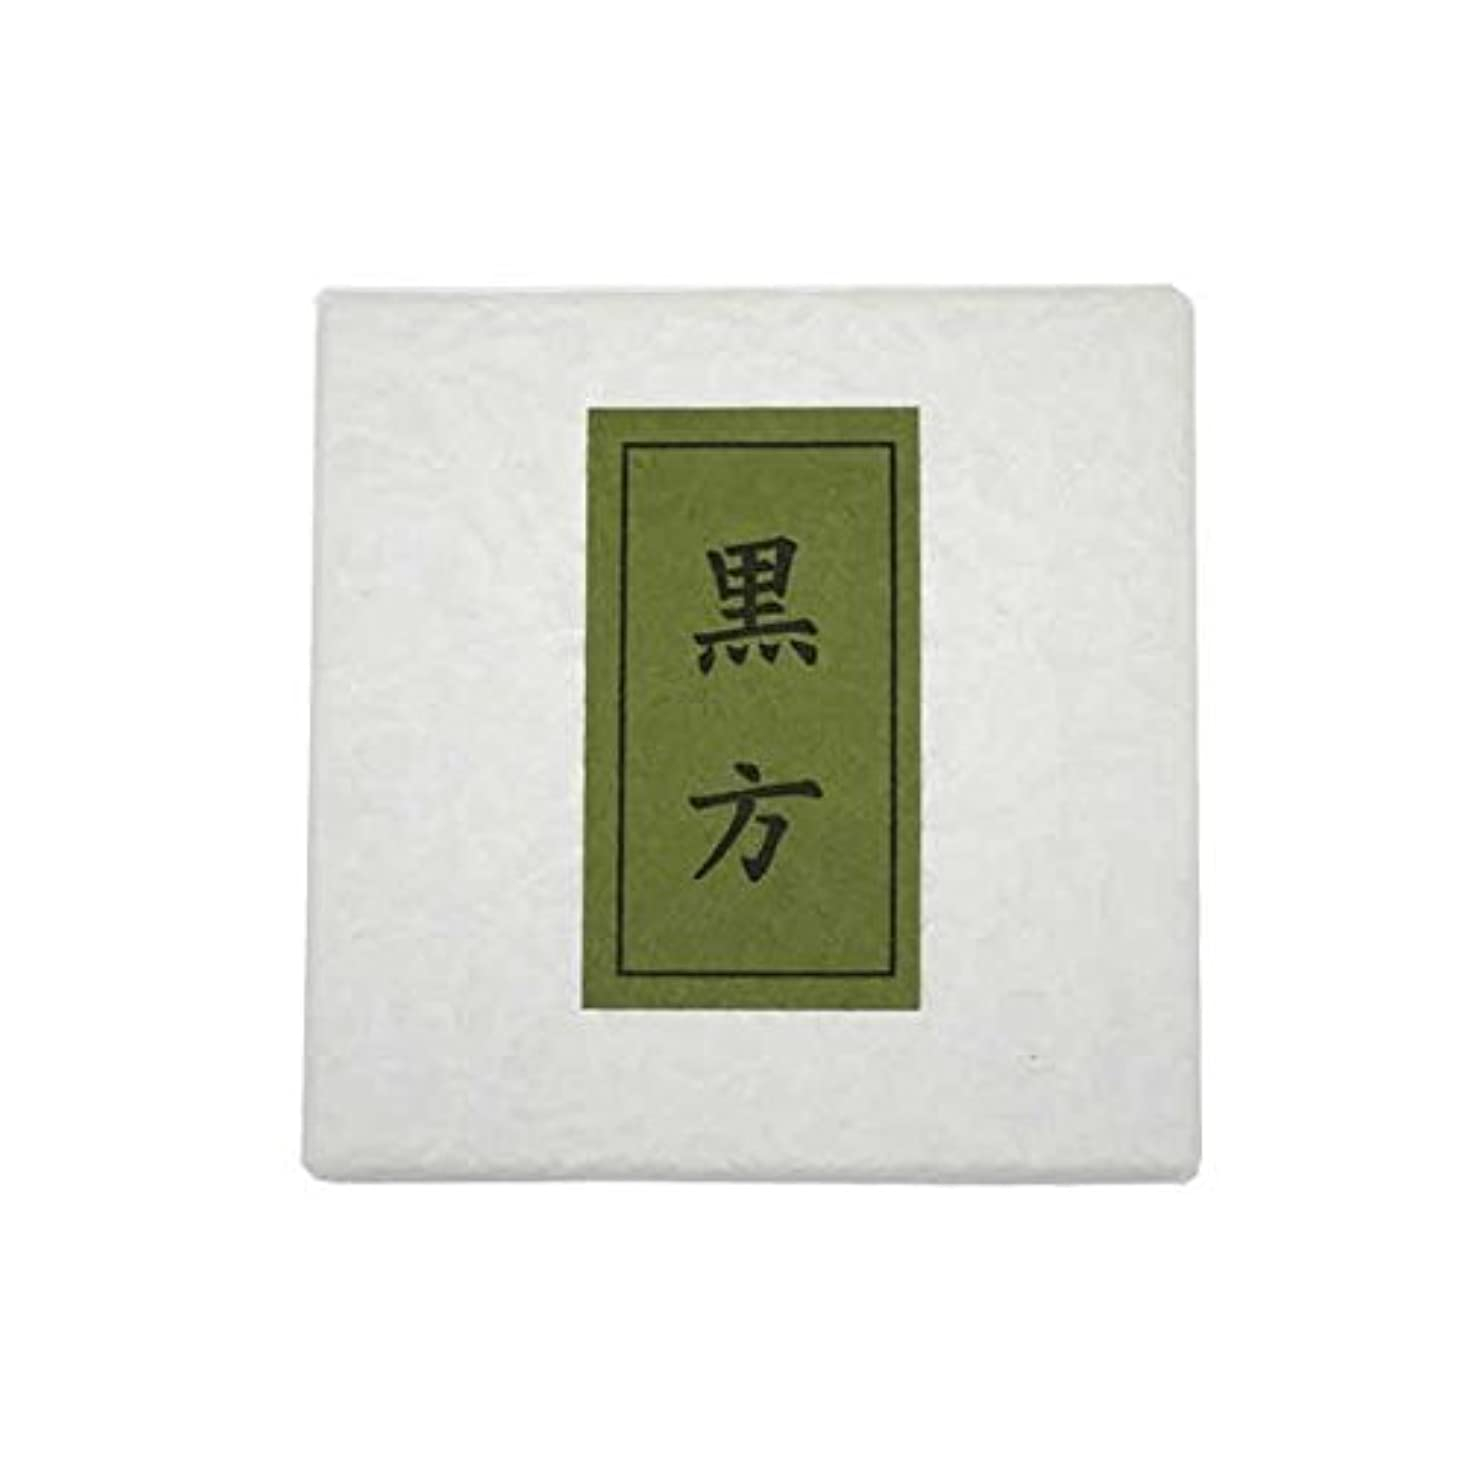 彫刻家削減農業黒方 紙箱入(ビニール入)